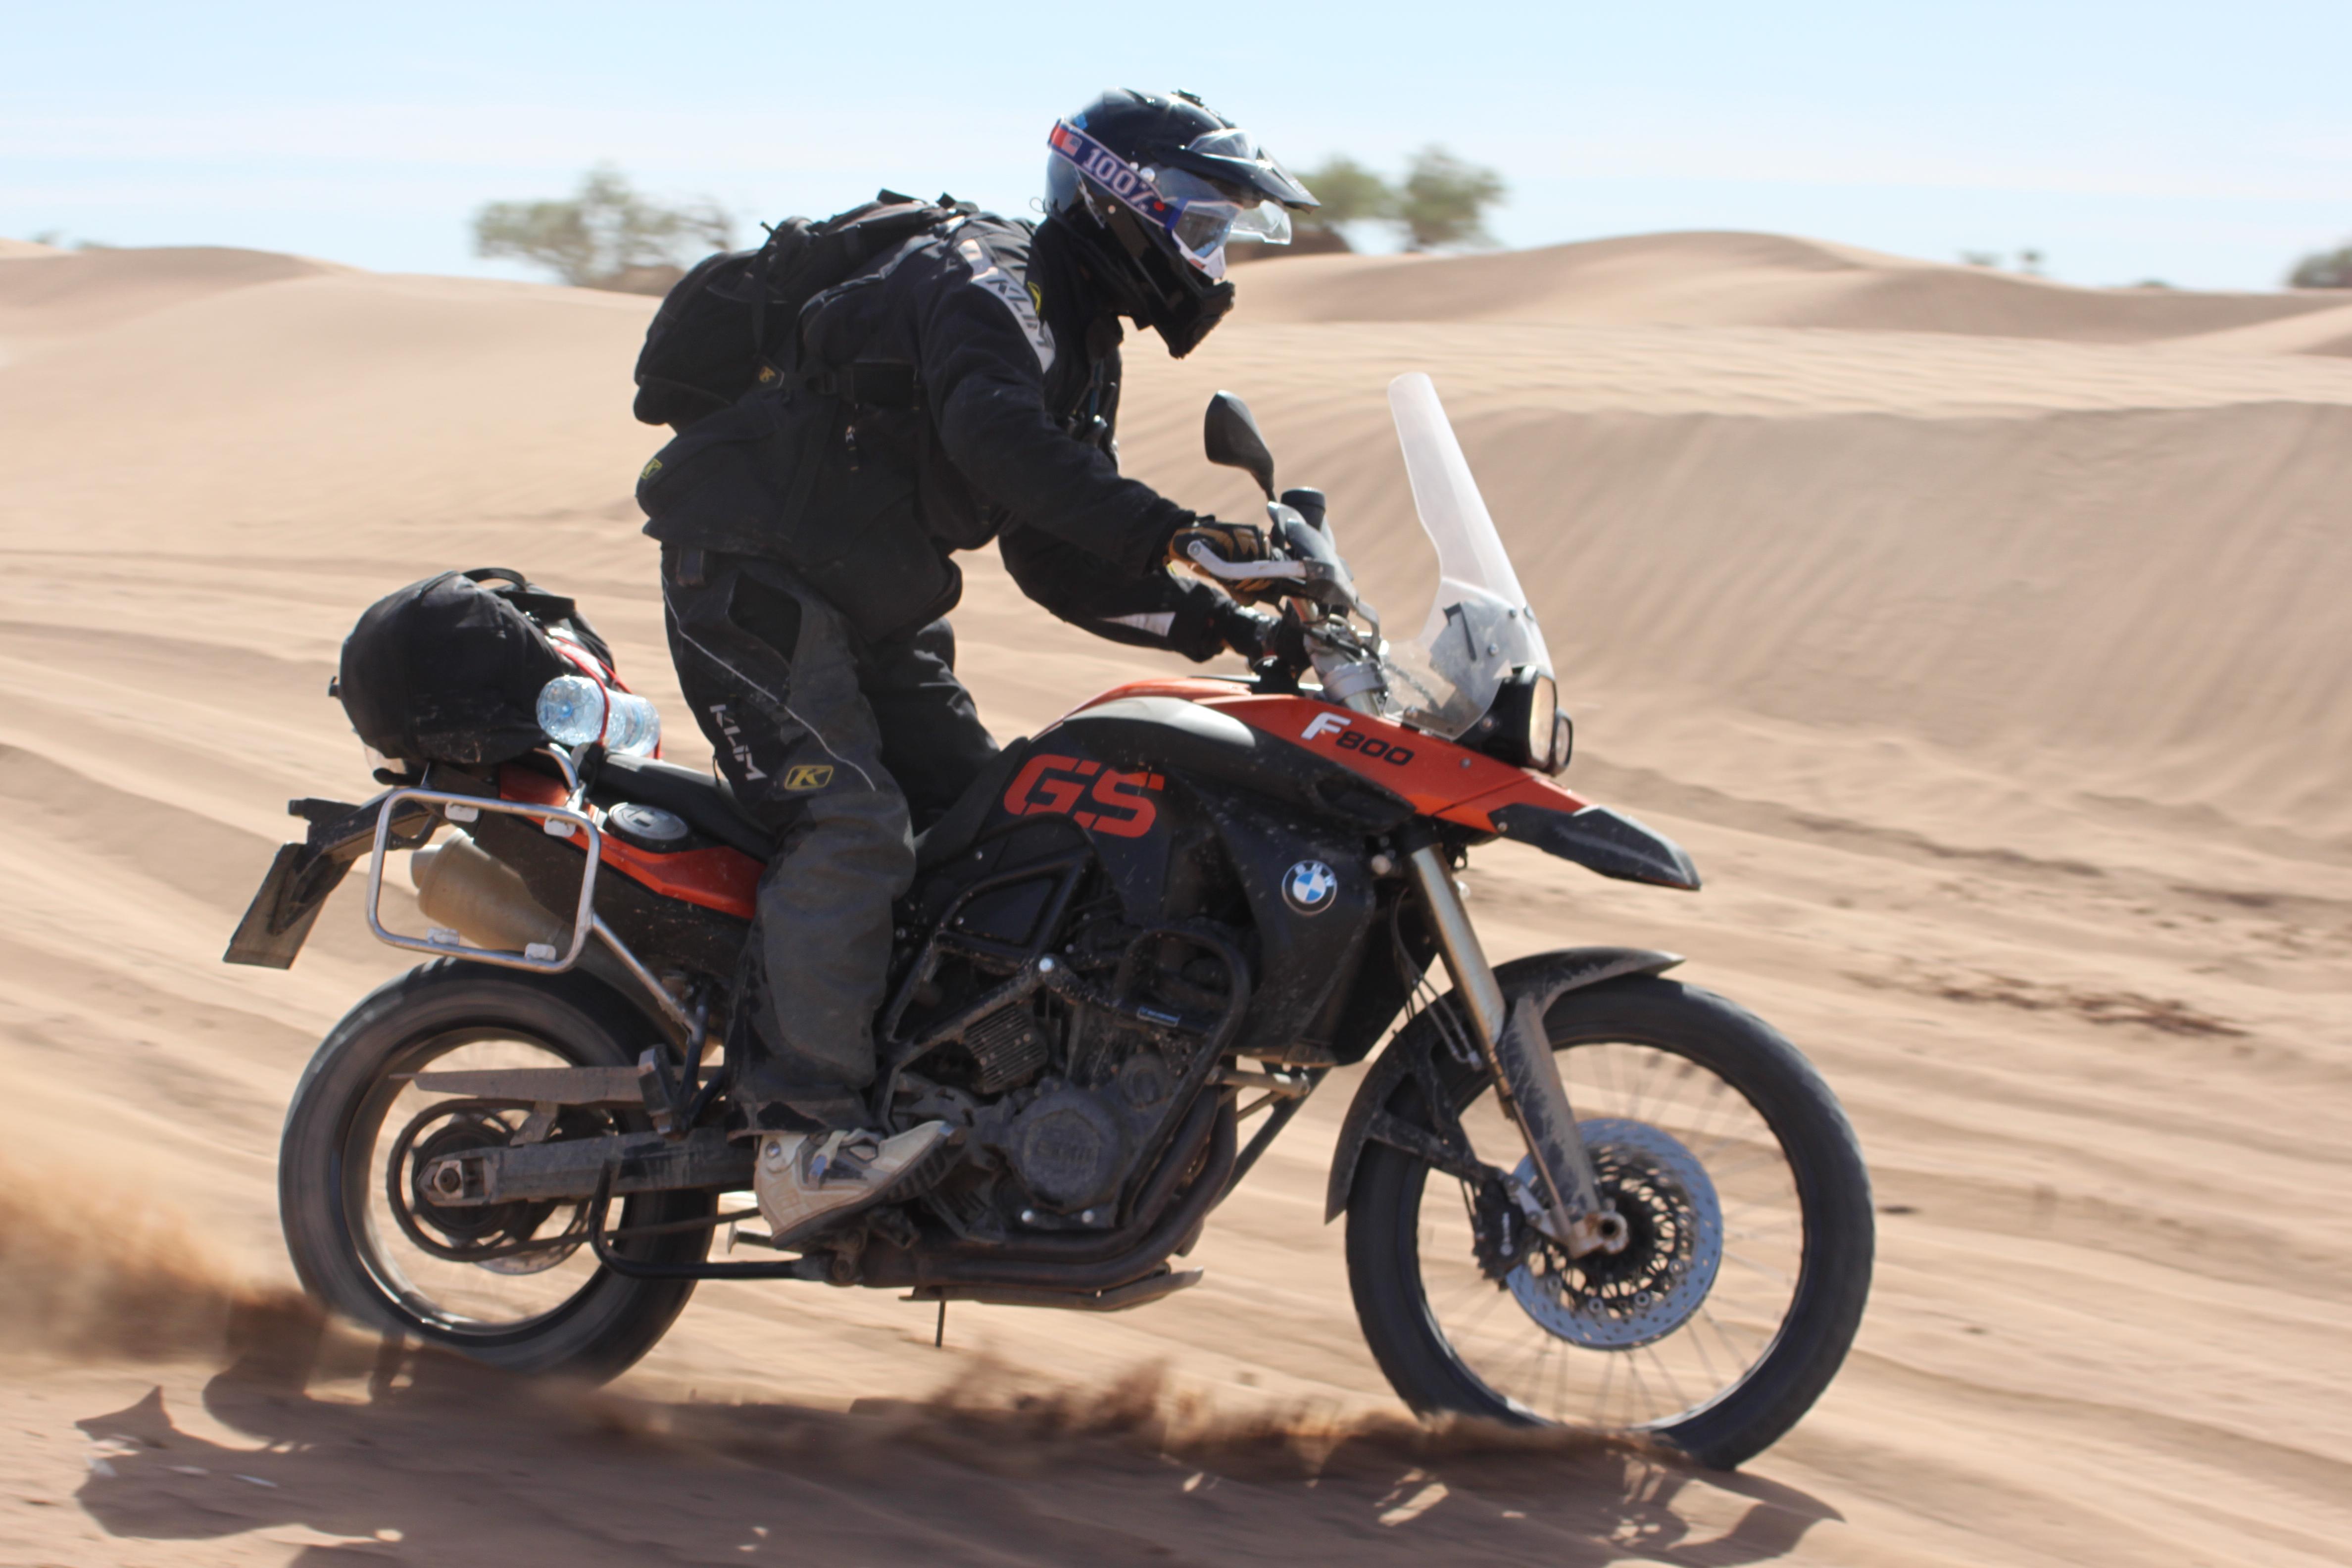 File:BMW F800GS black-red Sahara Desert- Morocco.jpg - Wikimedia Commons